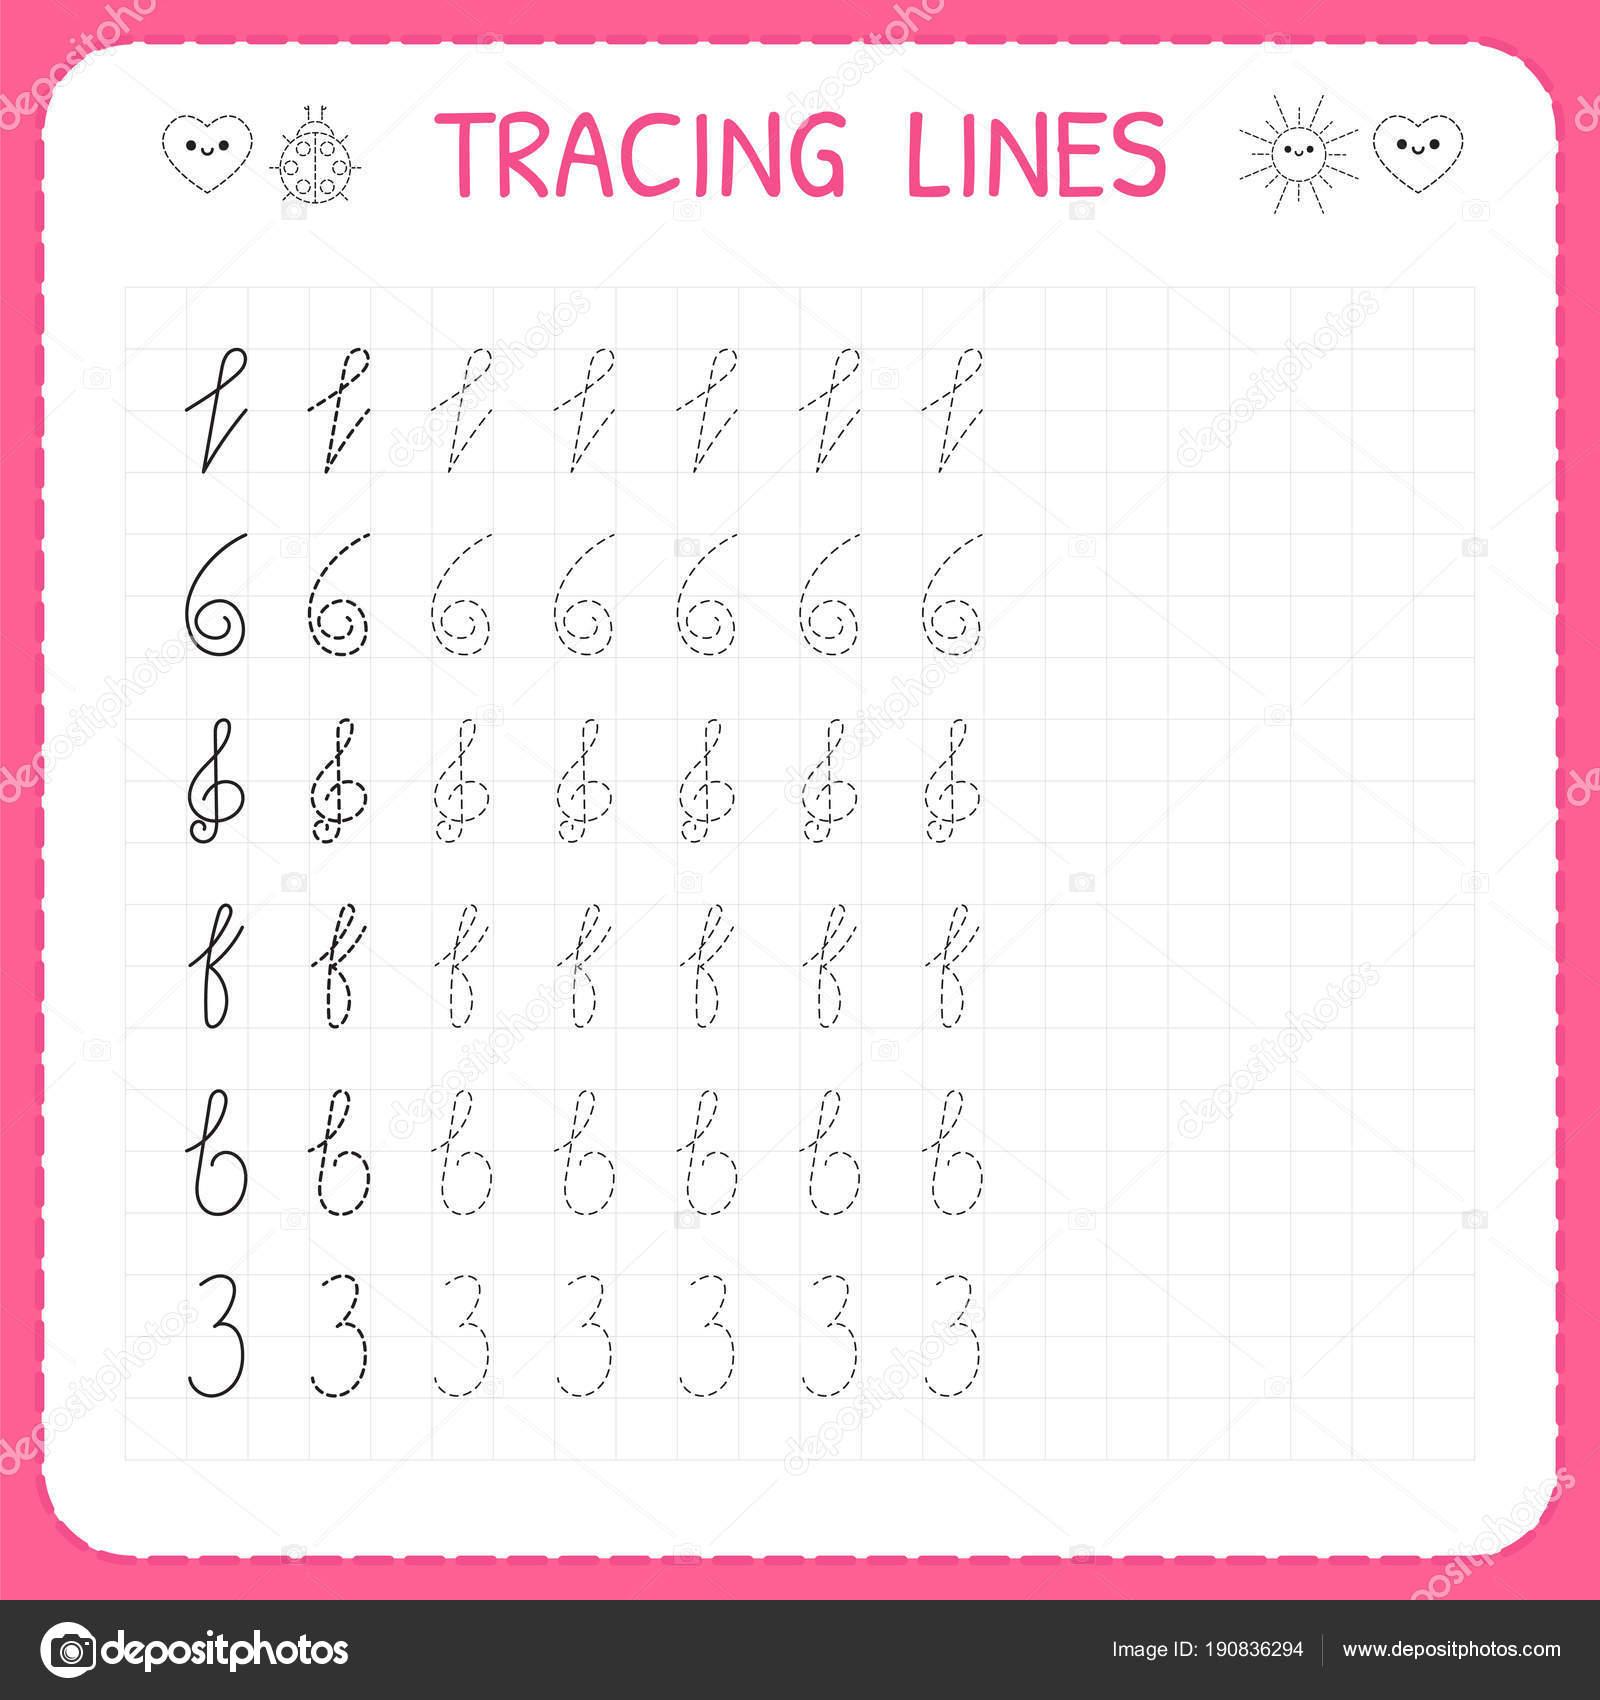 Tracing Lines Workbook